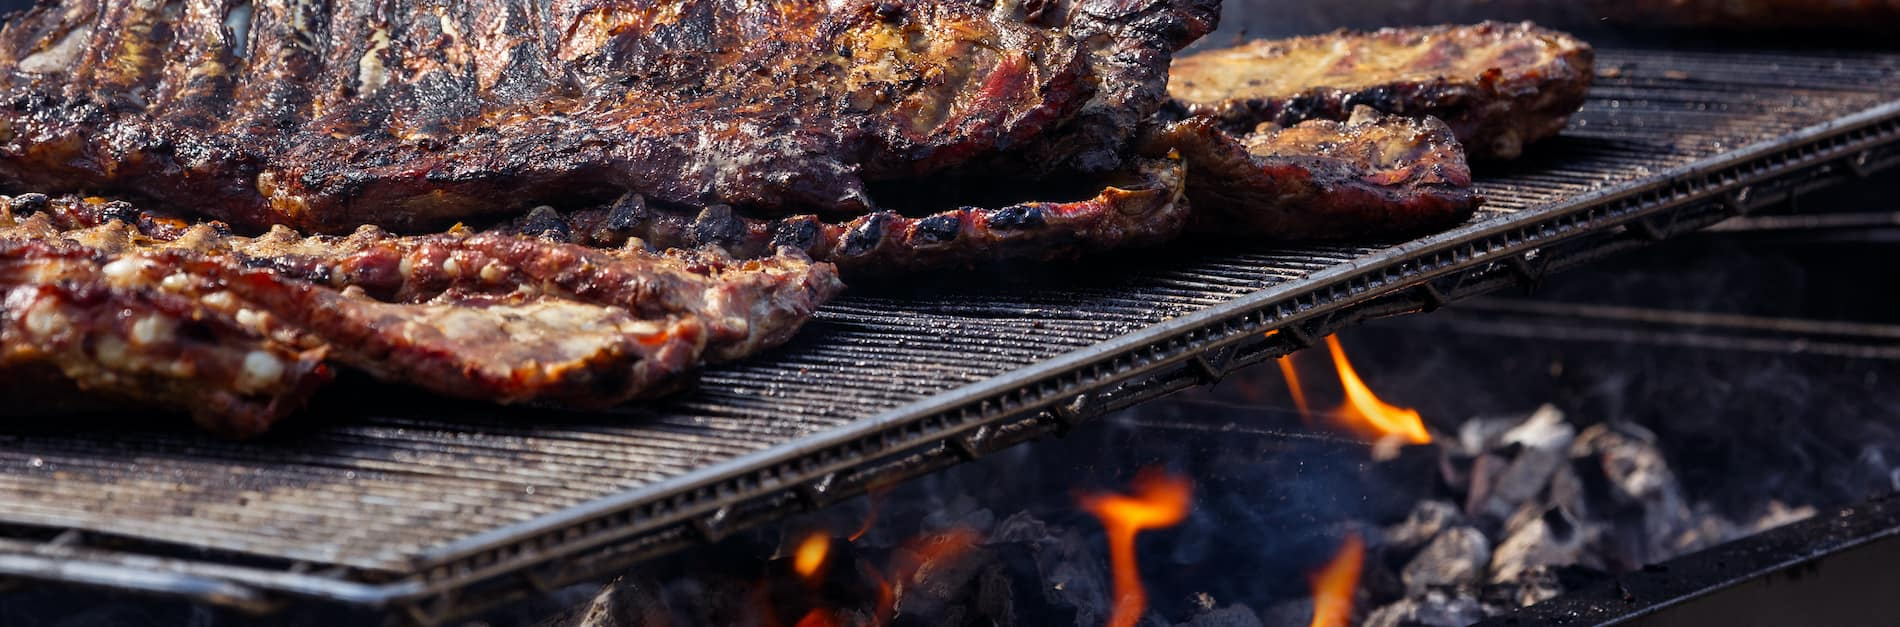 Best Local BBQ near Wilsonville OR